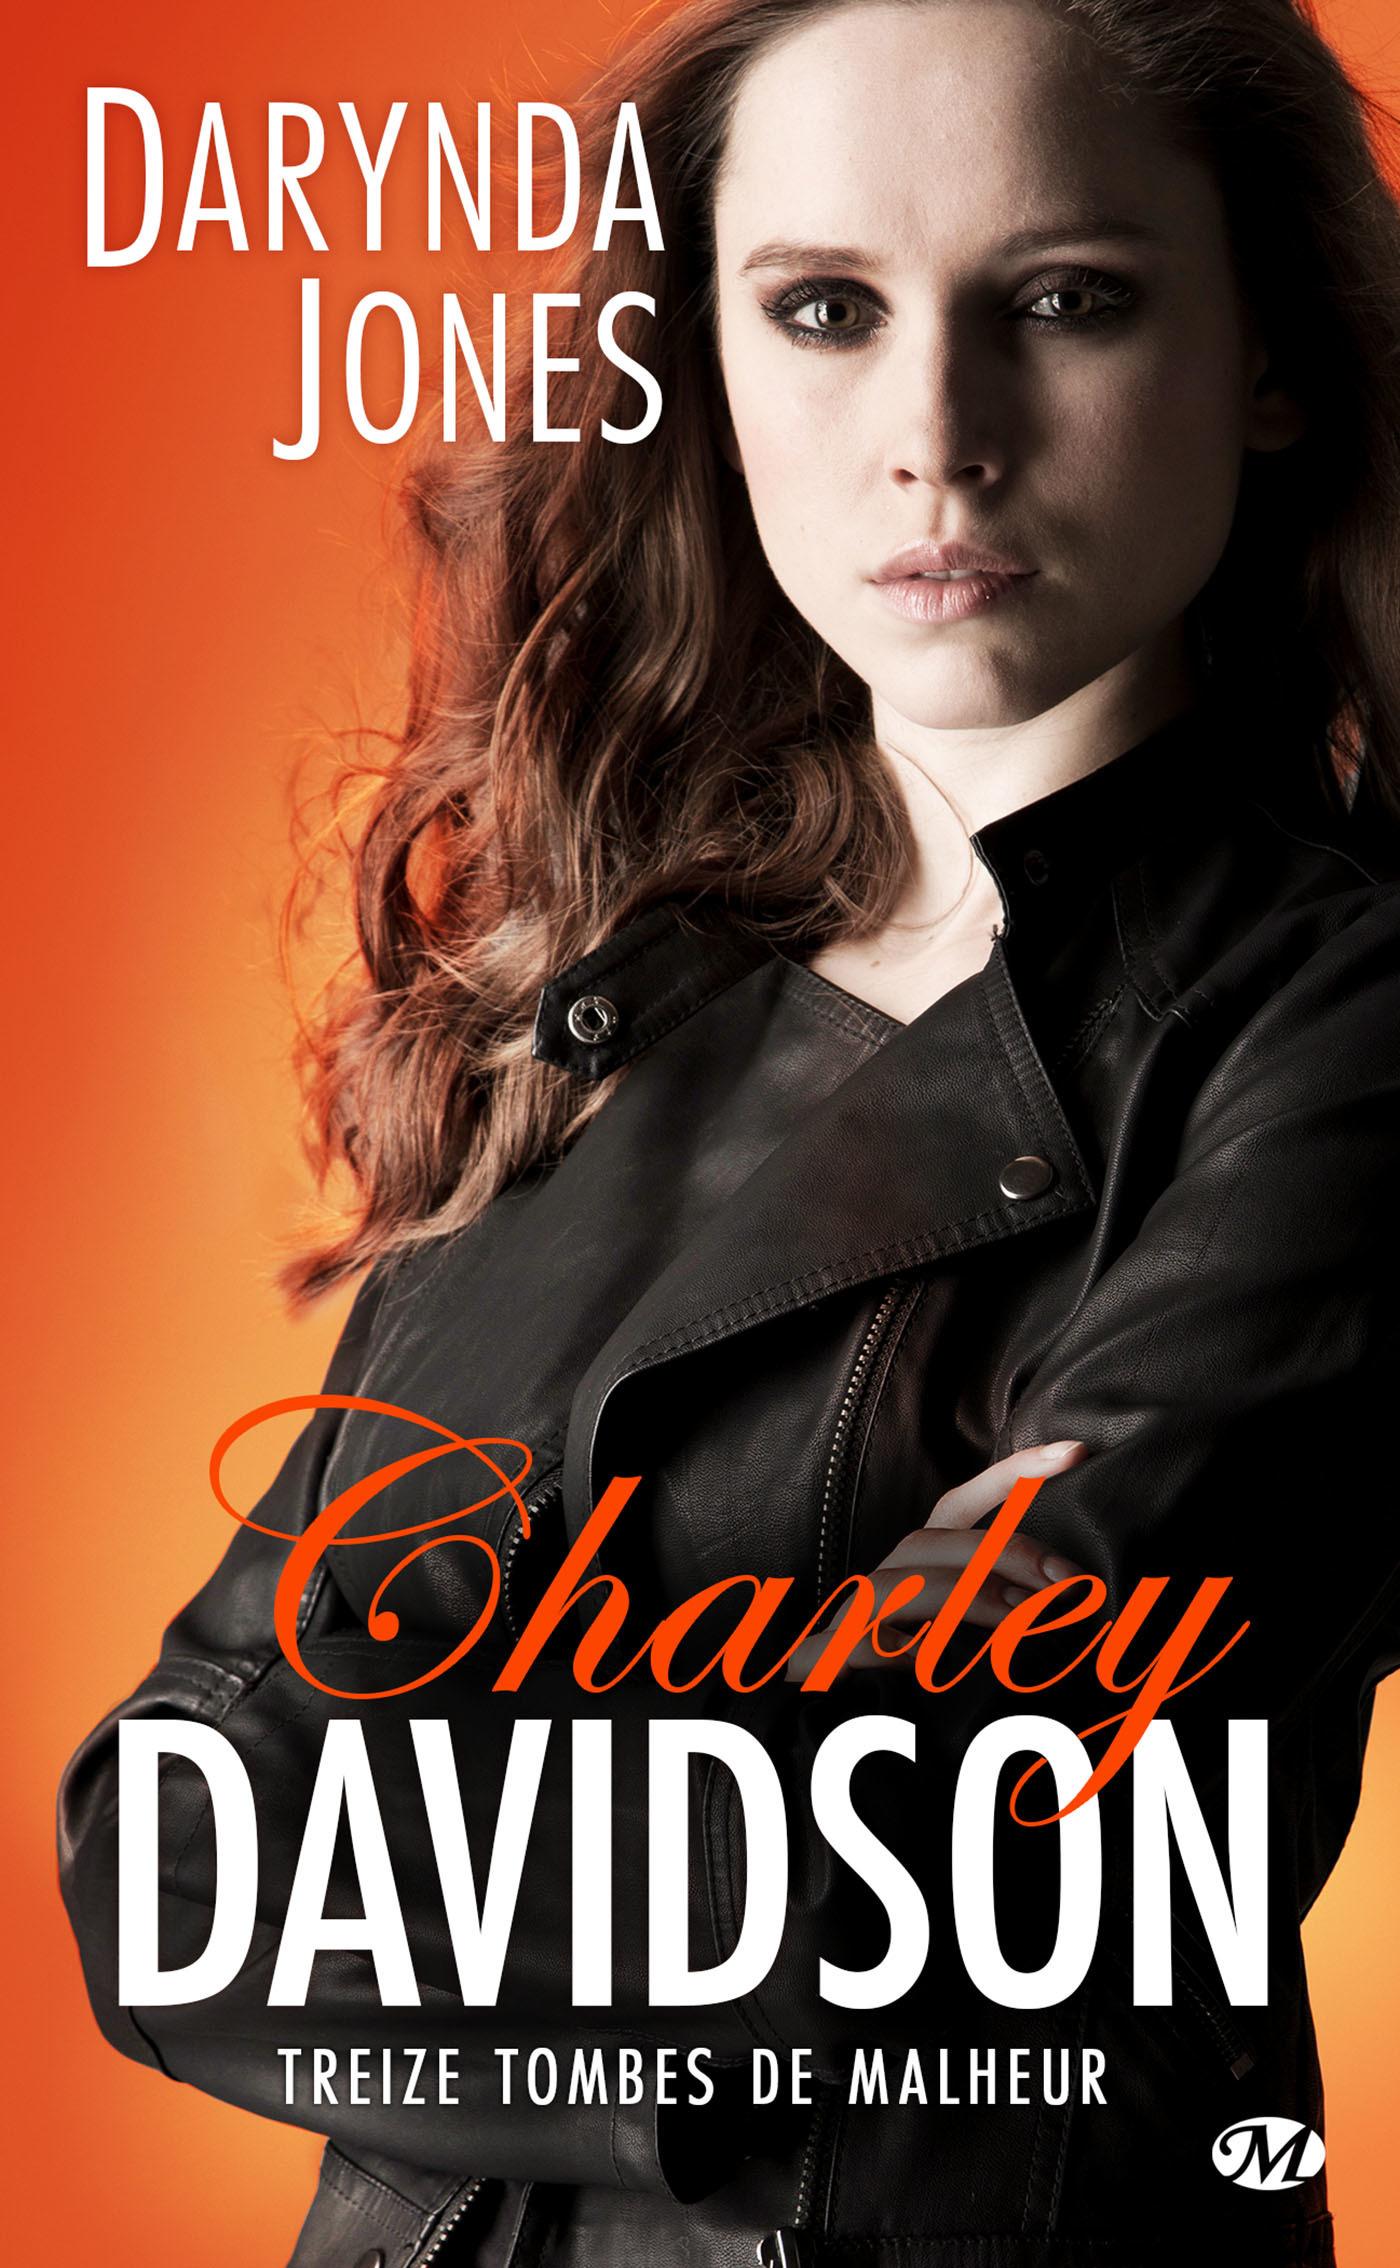 Charley Davidson T.13 ; treize tombes de malheur